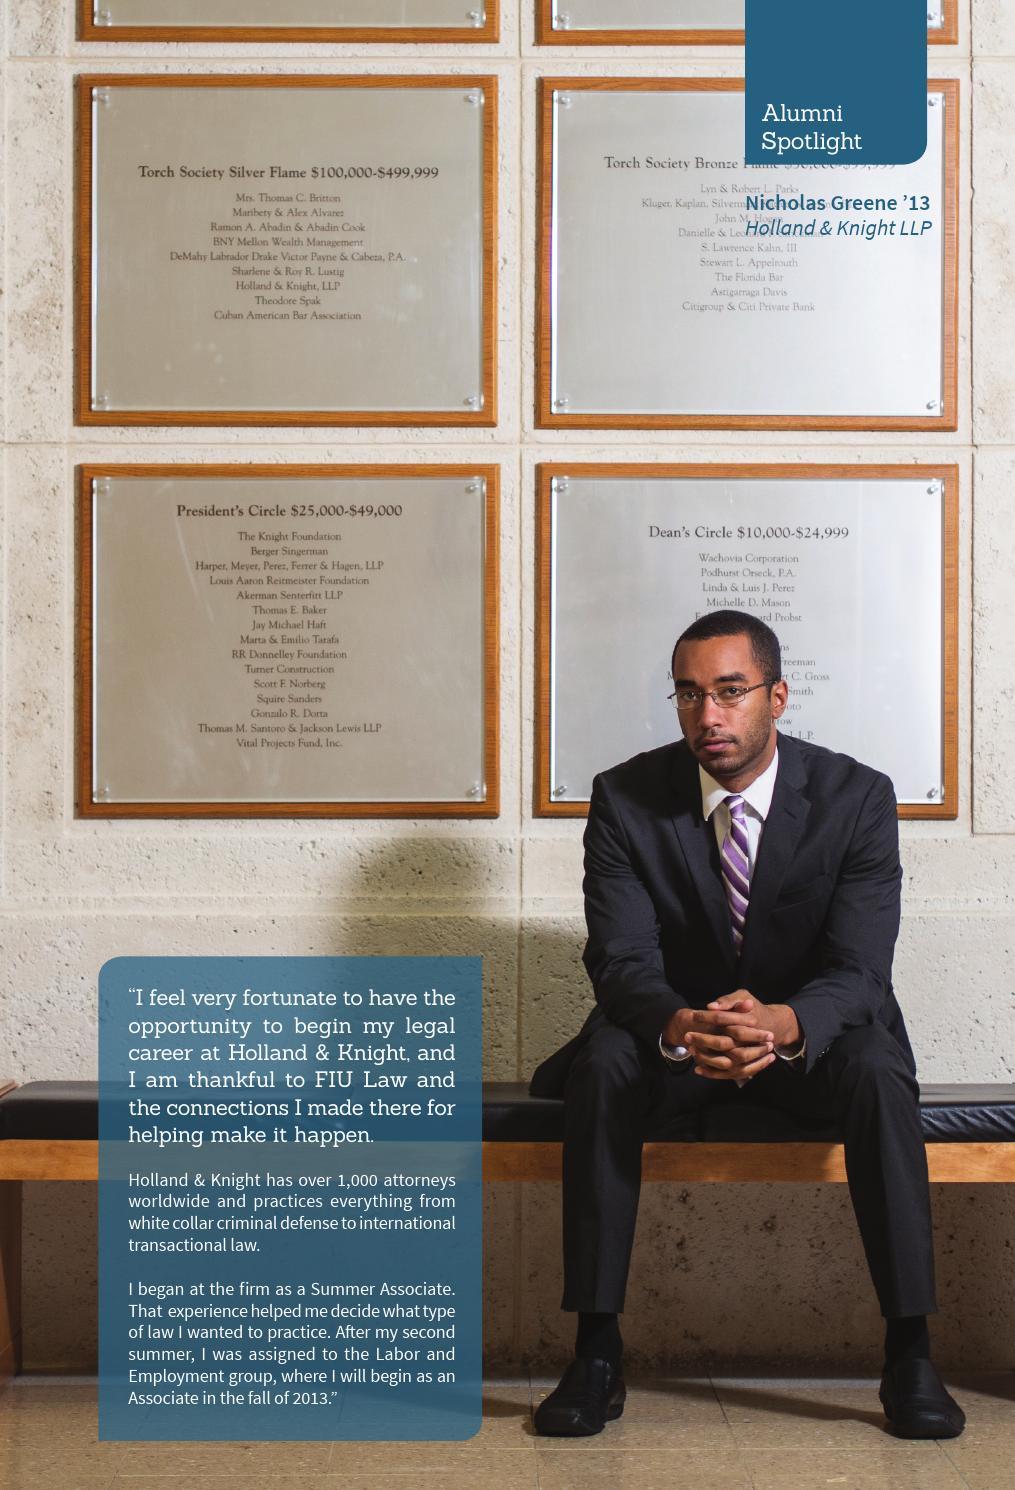 FIU Law 2013-2014 Viewbook by Law Web - issuu